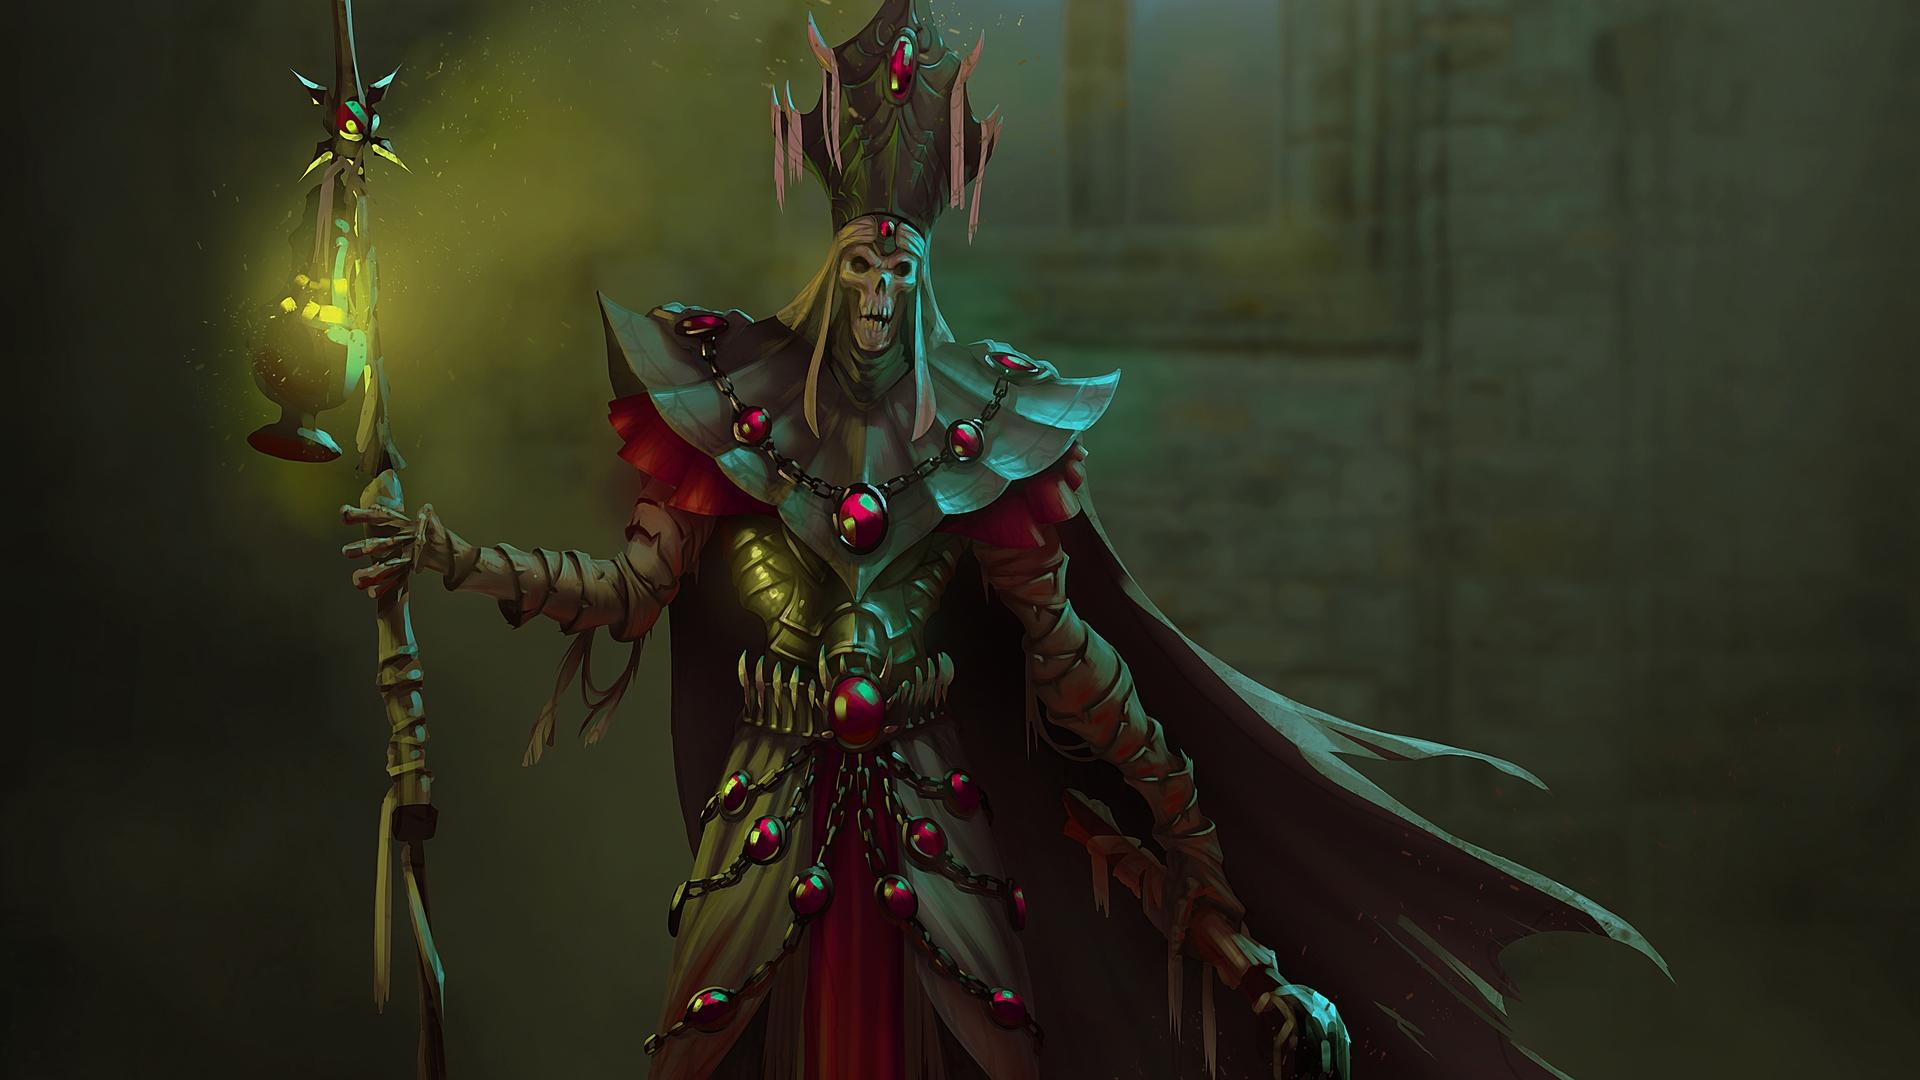 Undead Art Divinity - Divinity Original Sin Lich , HD Wallpaper & Backgrounds